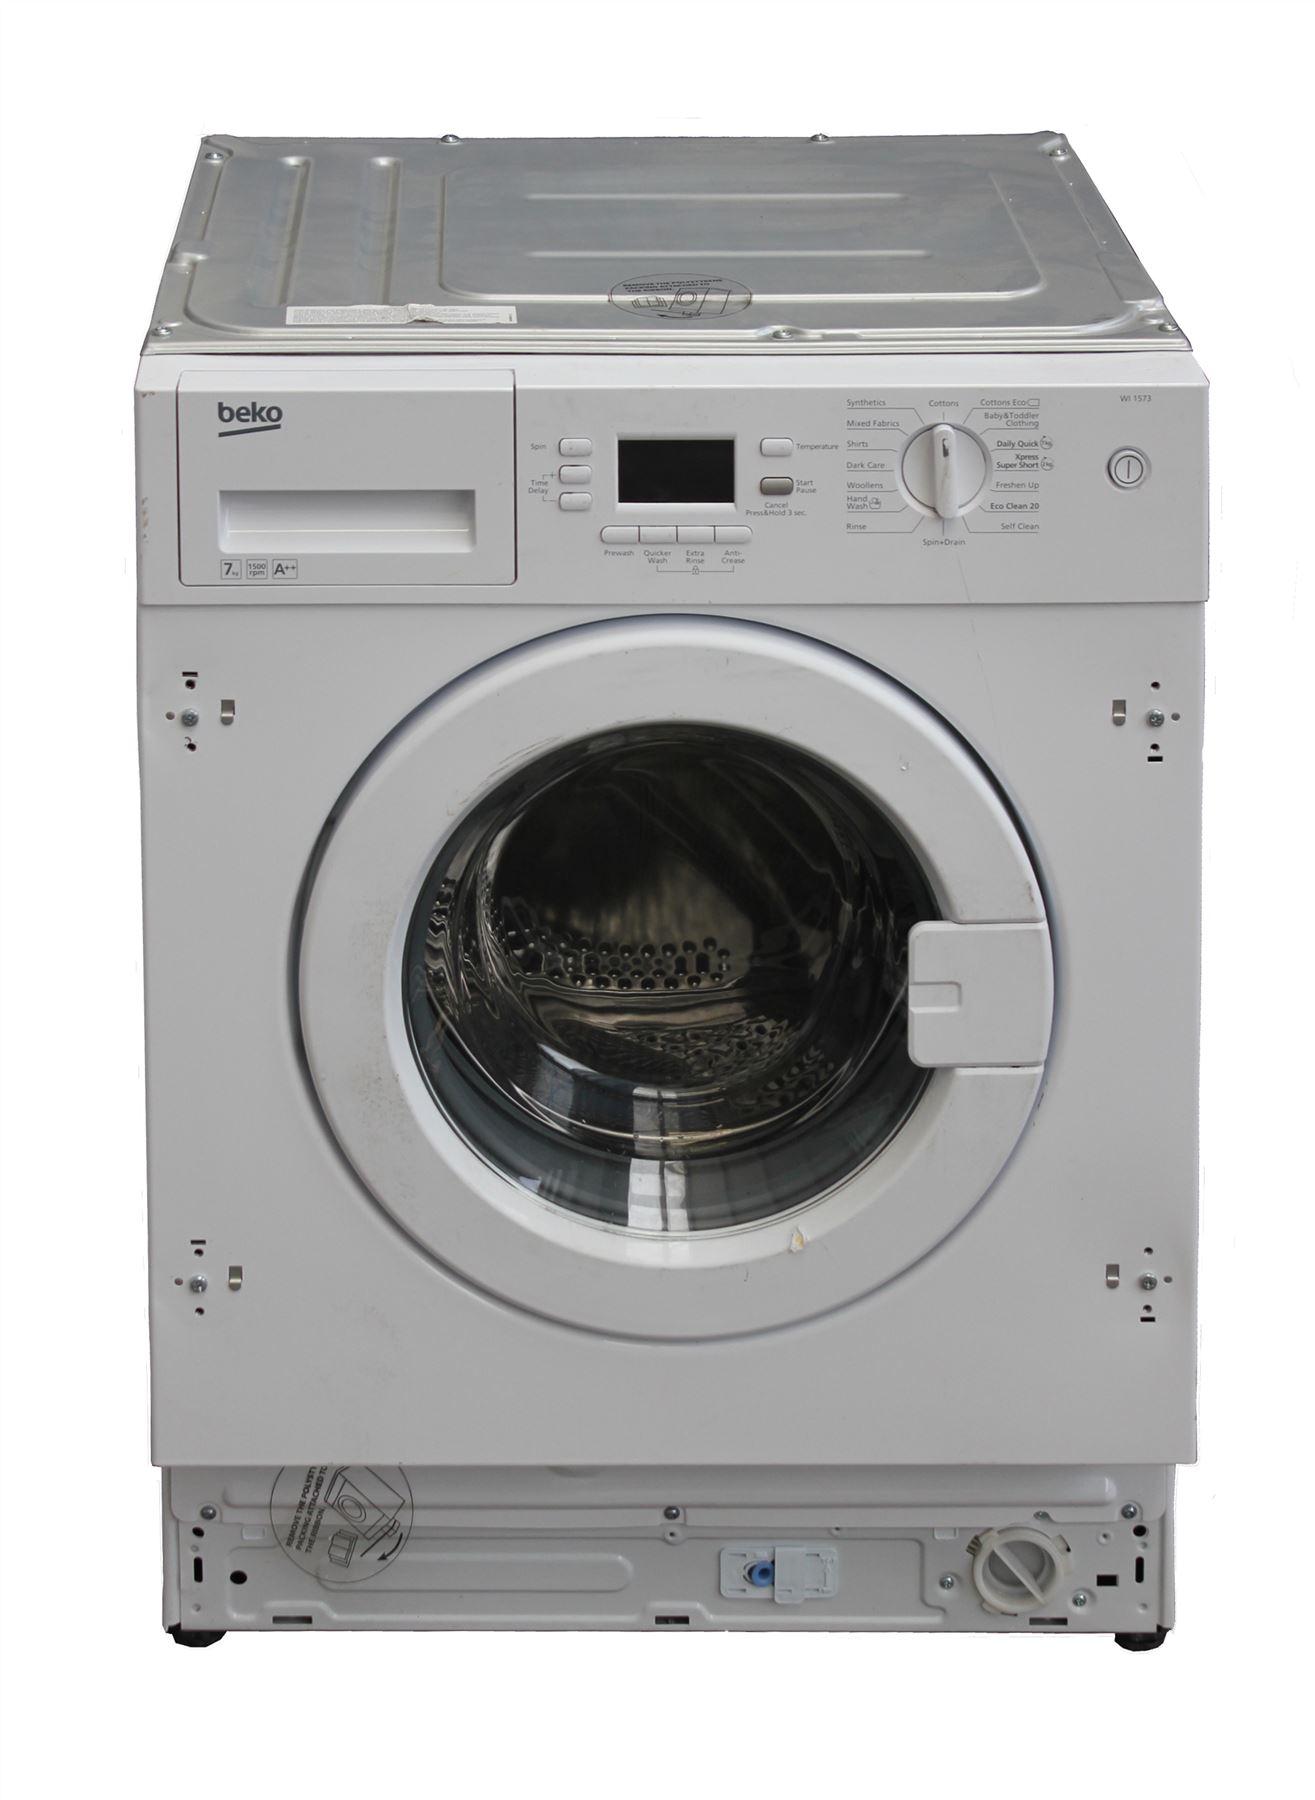 beko wi1573 integrated built in 7 kg washing machine a. Black Bedroom Furniture Sets. Home Design Ideas